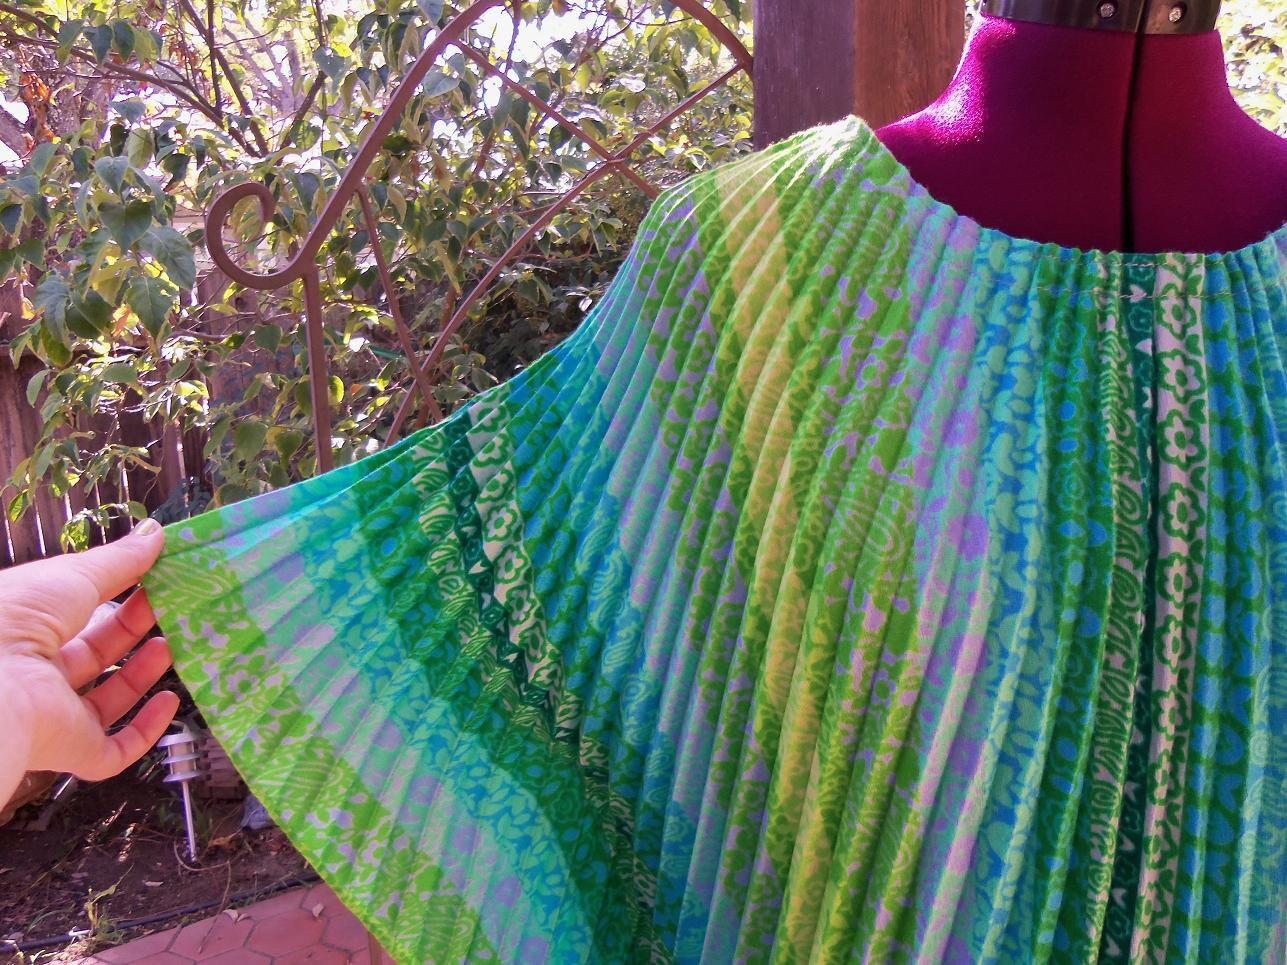 RESERVED FOR LALUNA13 Vintage Poncho Cape Blouse Accordian Pleats Size S M L Free Size - CherryDollyFace